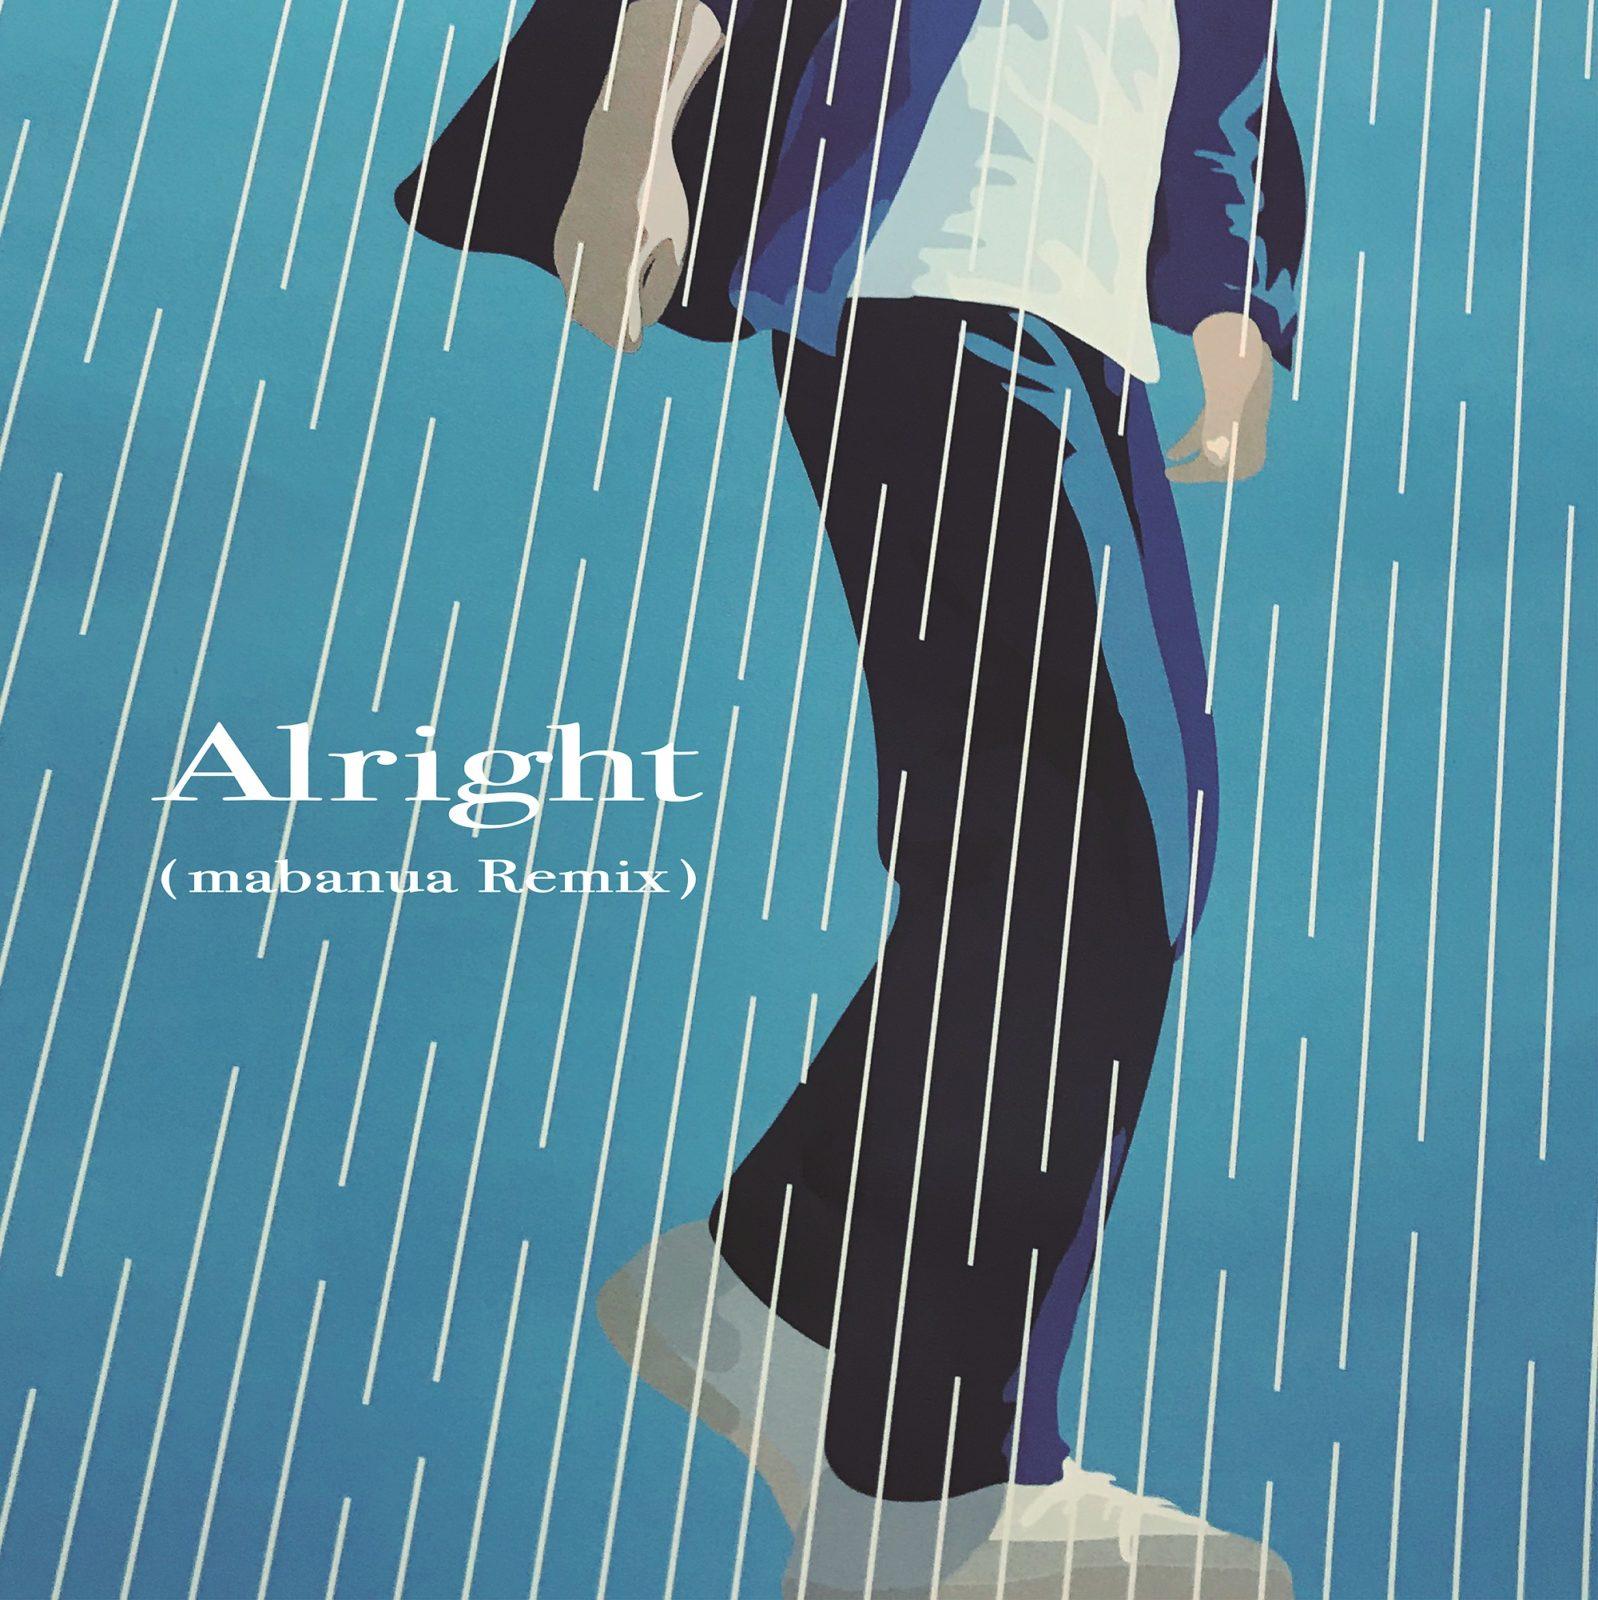 DedachiKenta、リミックス第2弾「Alright (mabanua Remix)」配信開始サムネイル画像